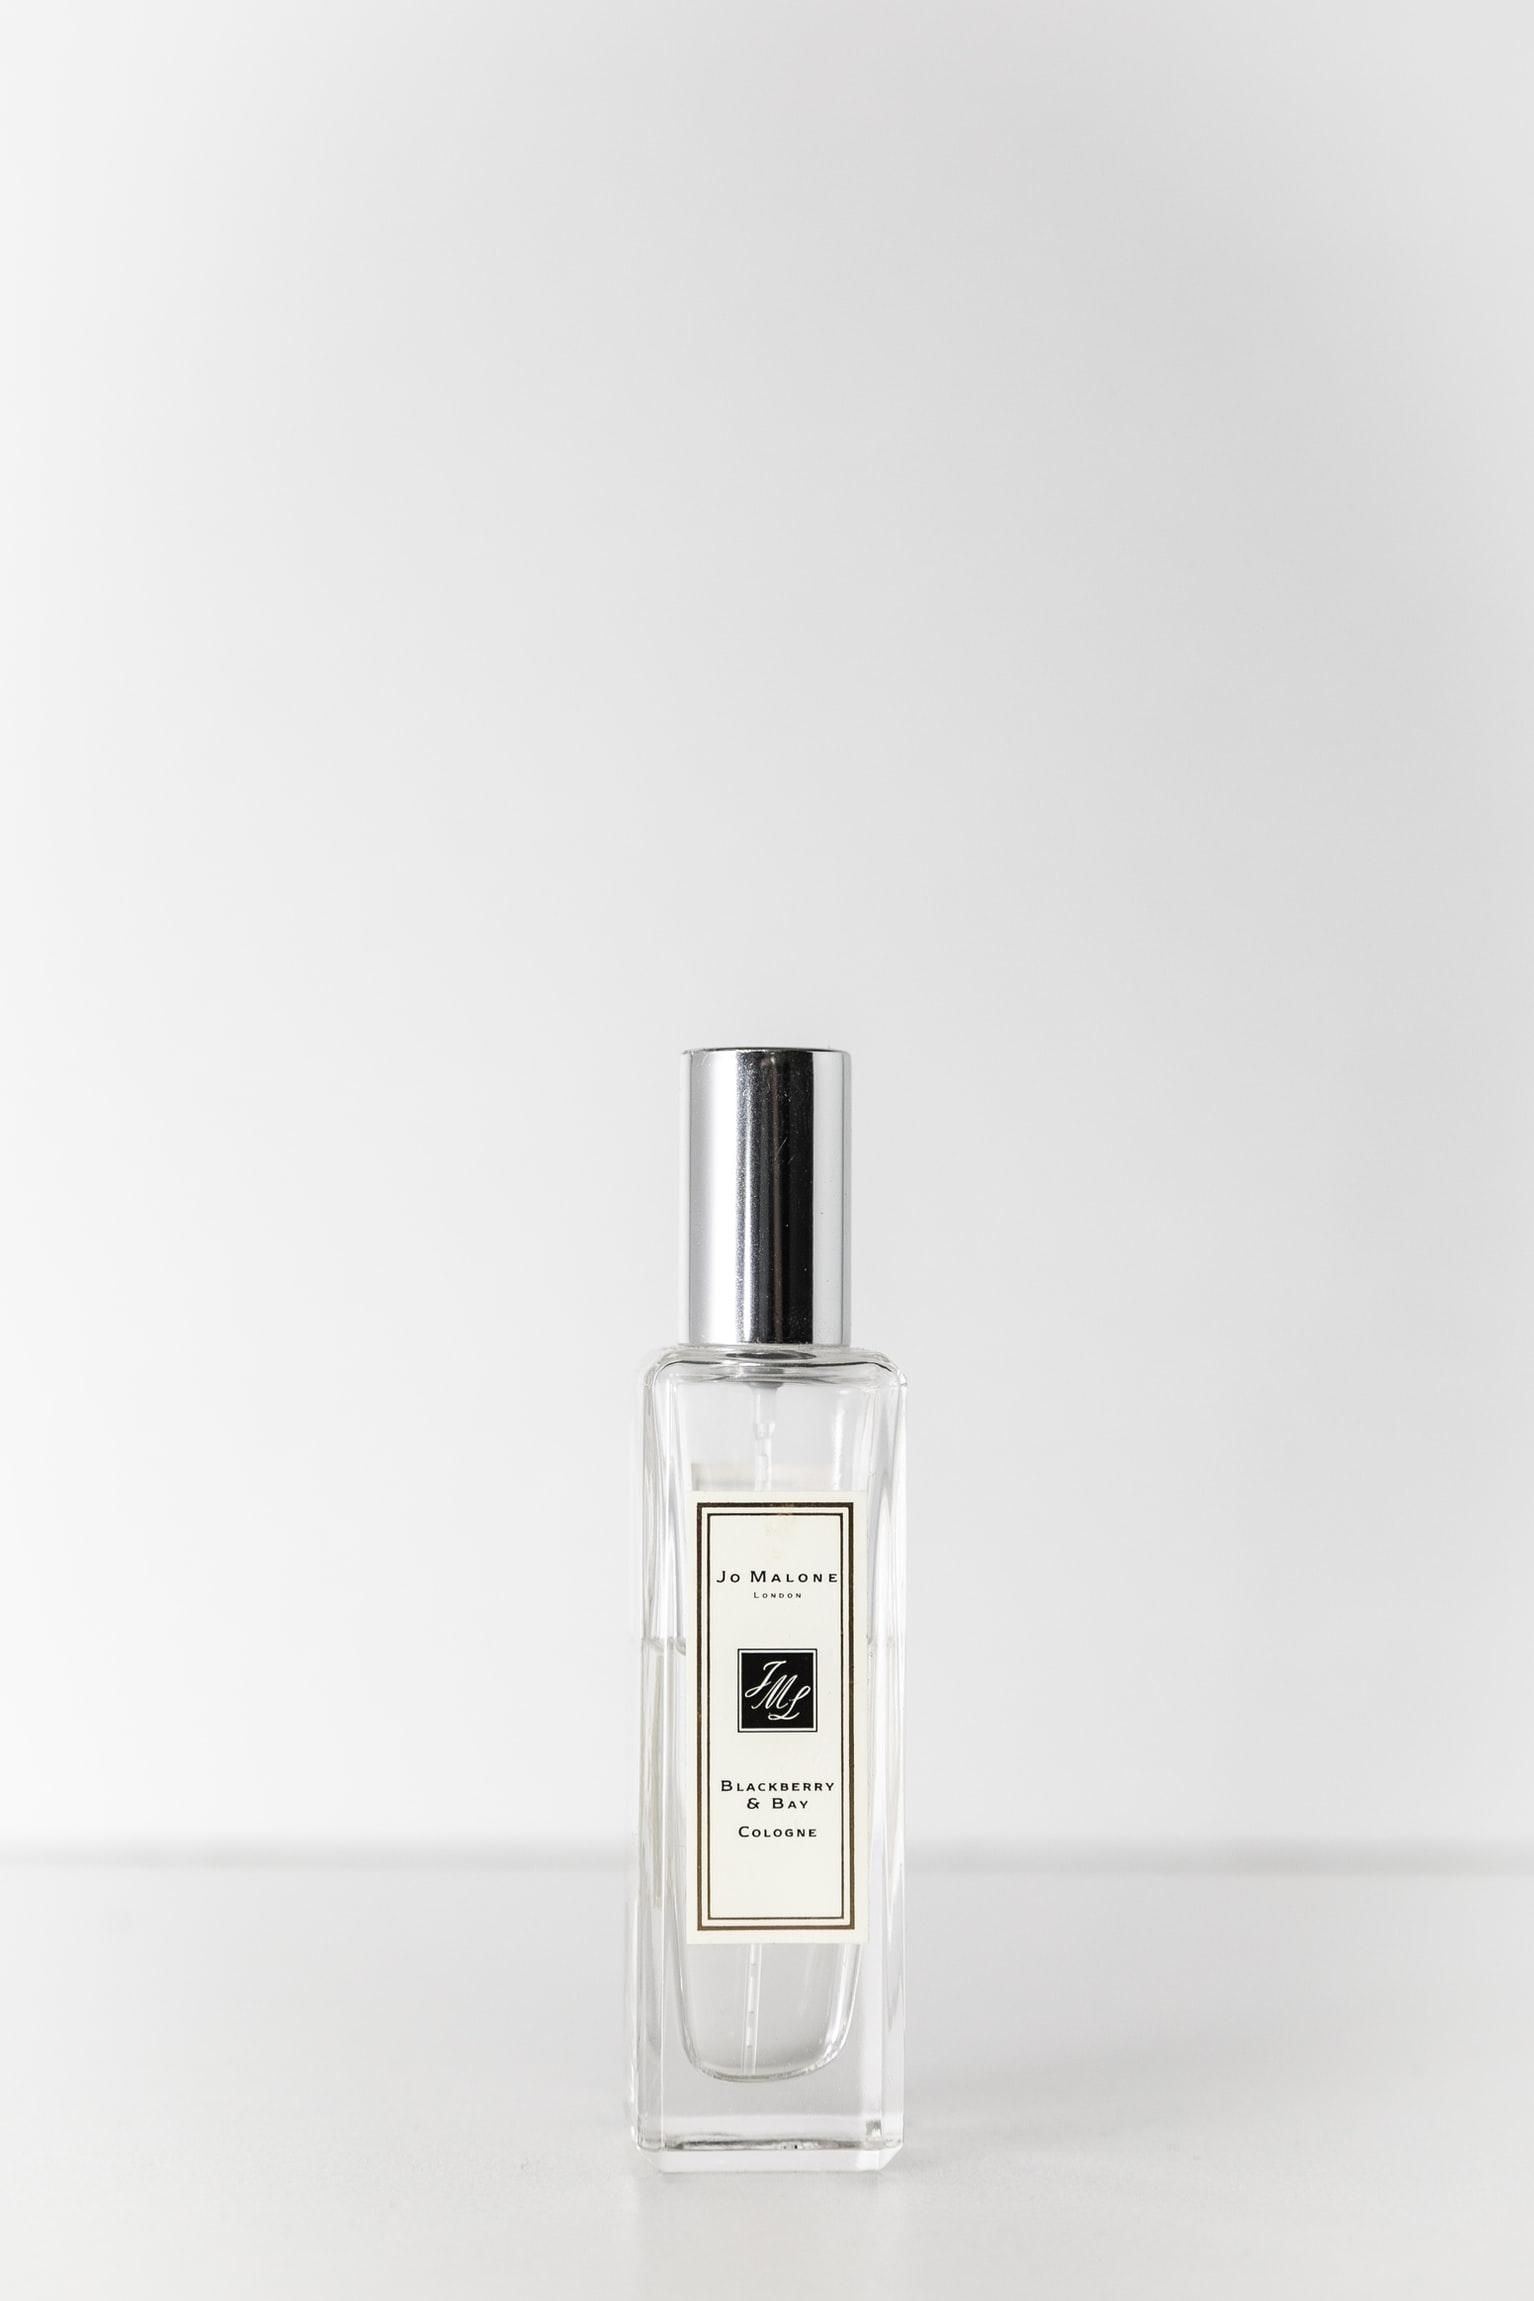 Jo Malon LONDON の香水でリフレッシュ